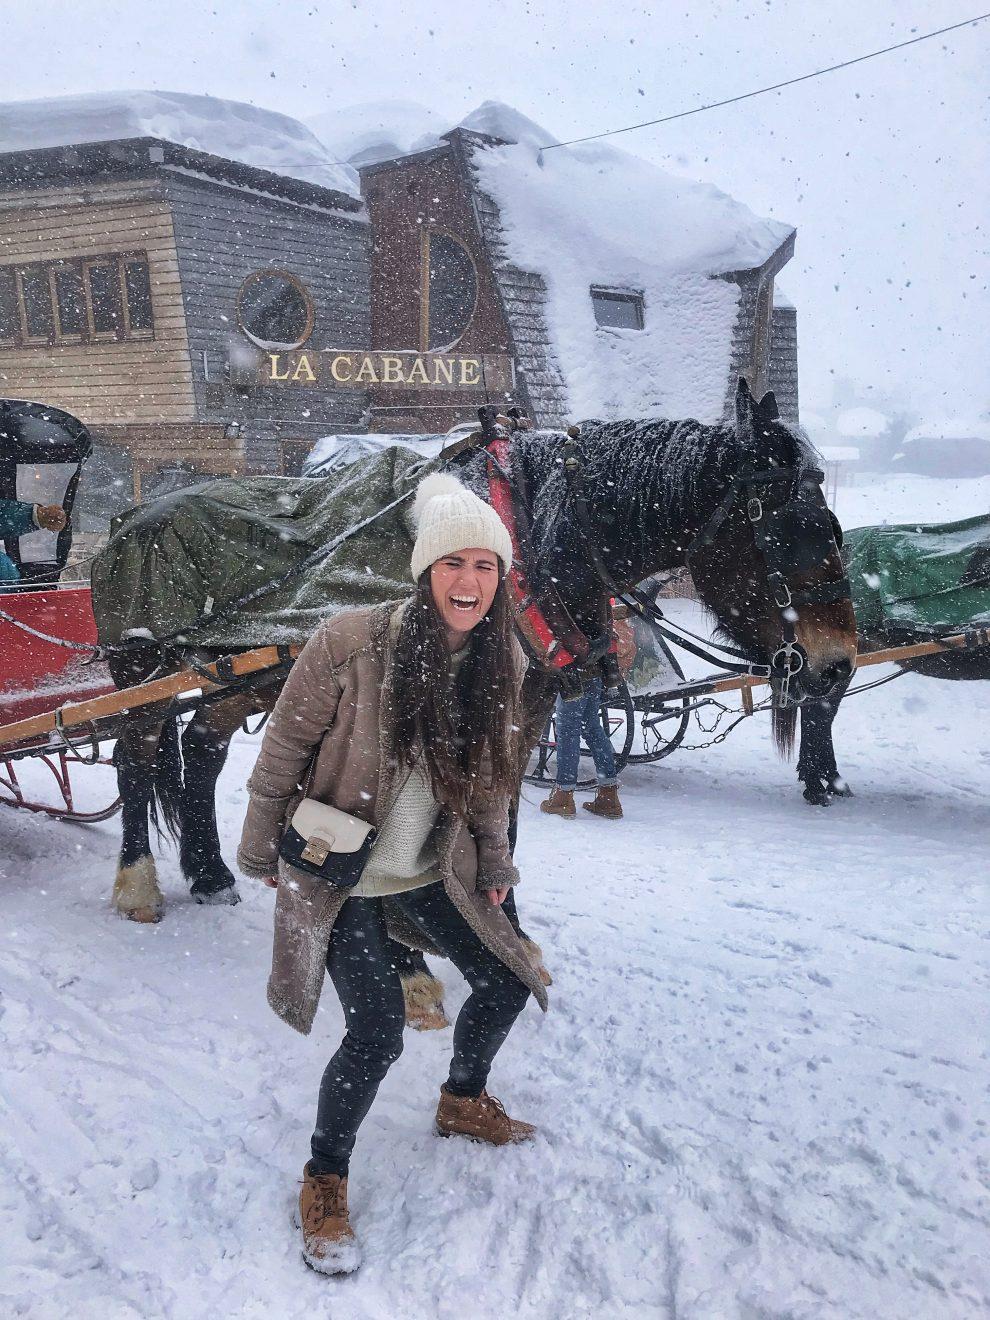 Wintersport Frankrijk Portes du Soleil ; Les Gets naar Avoriaz.